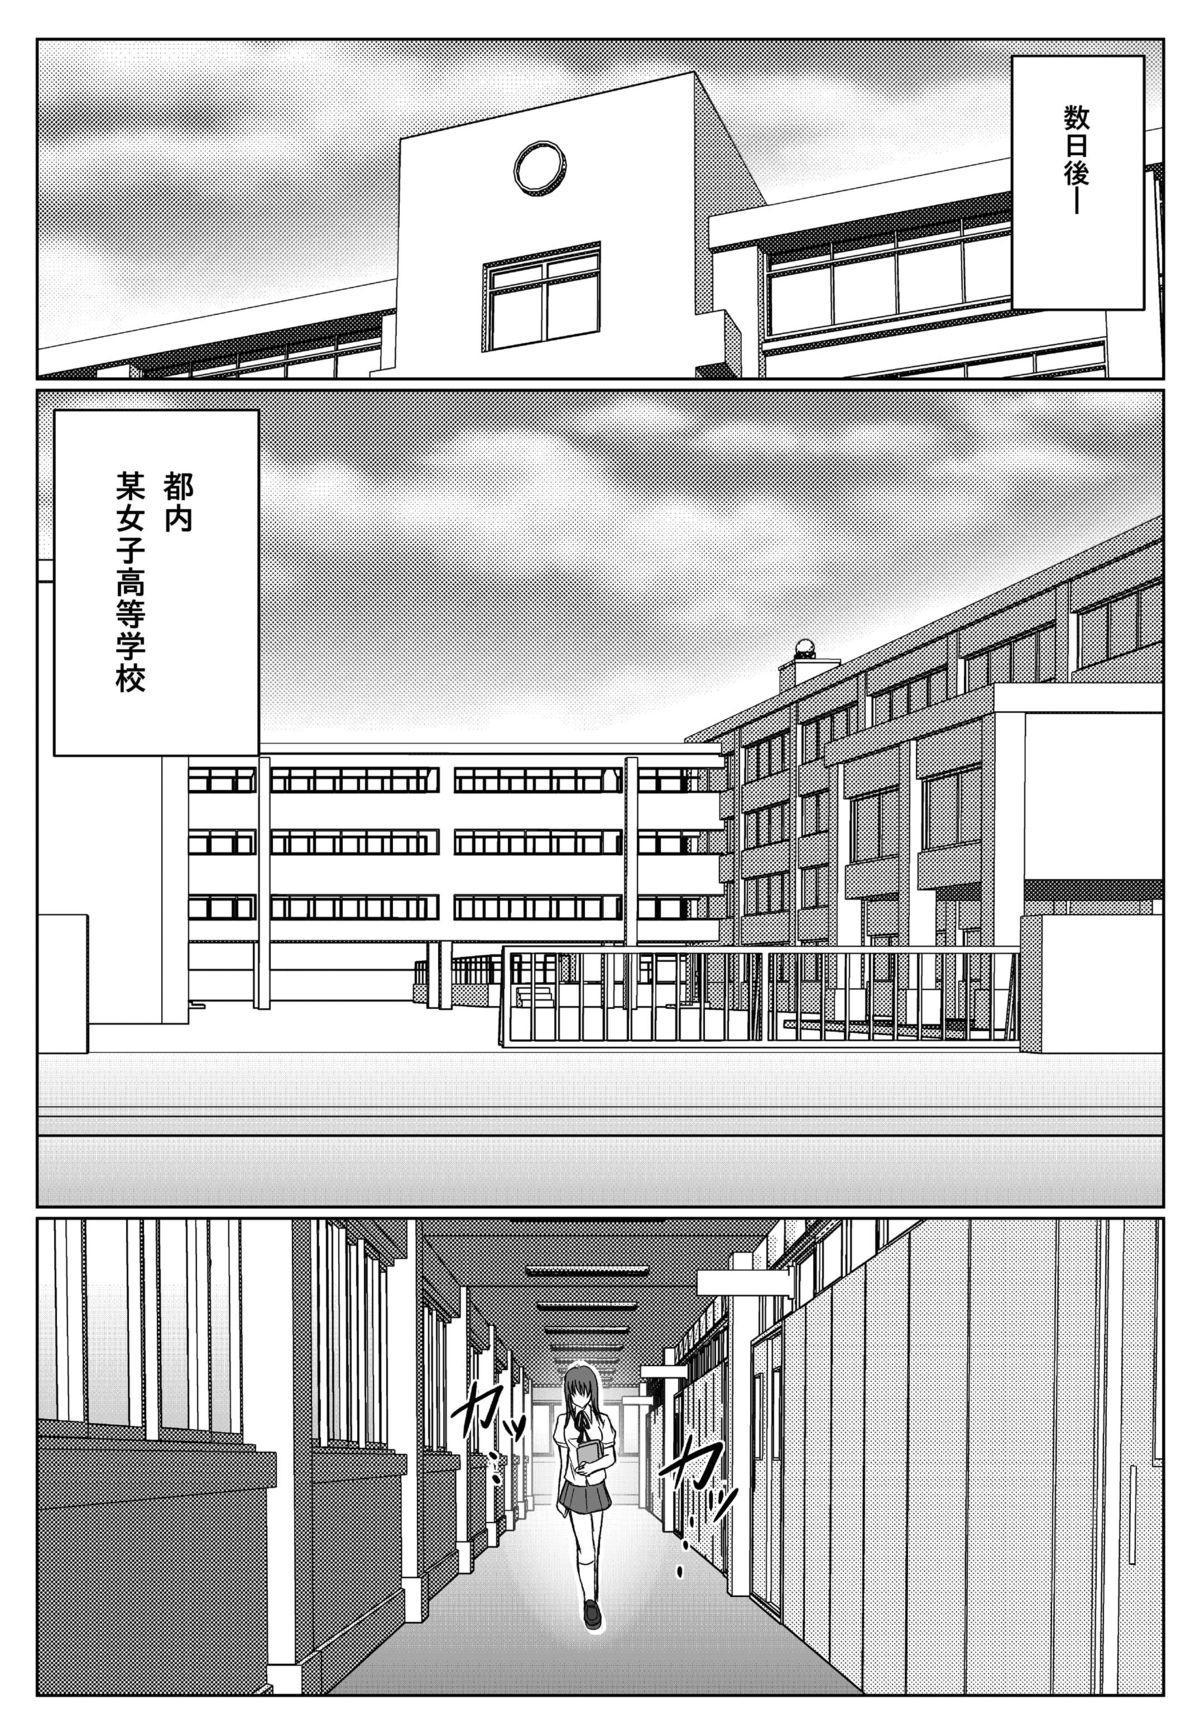 [Macxe's (monmon)] Tokubousentai Dinaranger ~Heroine Kairaku Sennou Keikaku~ Vol.01/02/03 (Renkaban) [Digital] 70